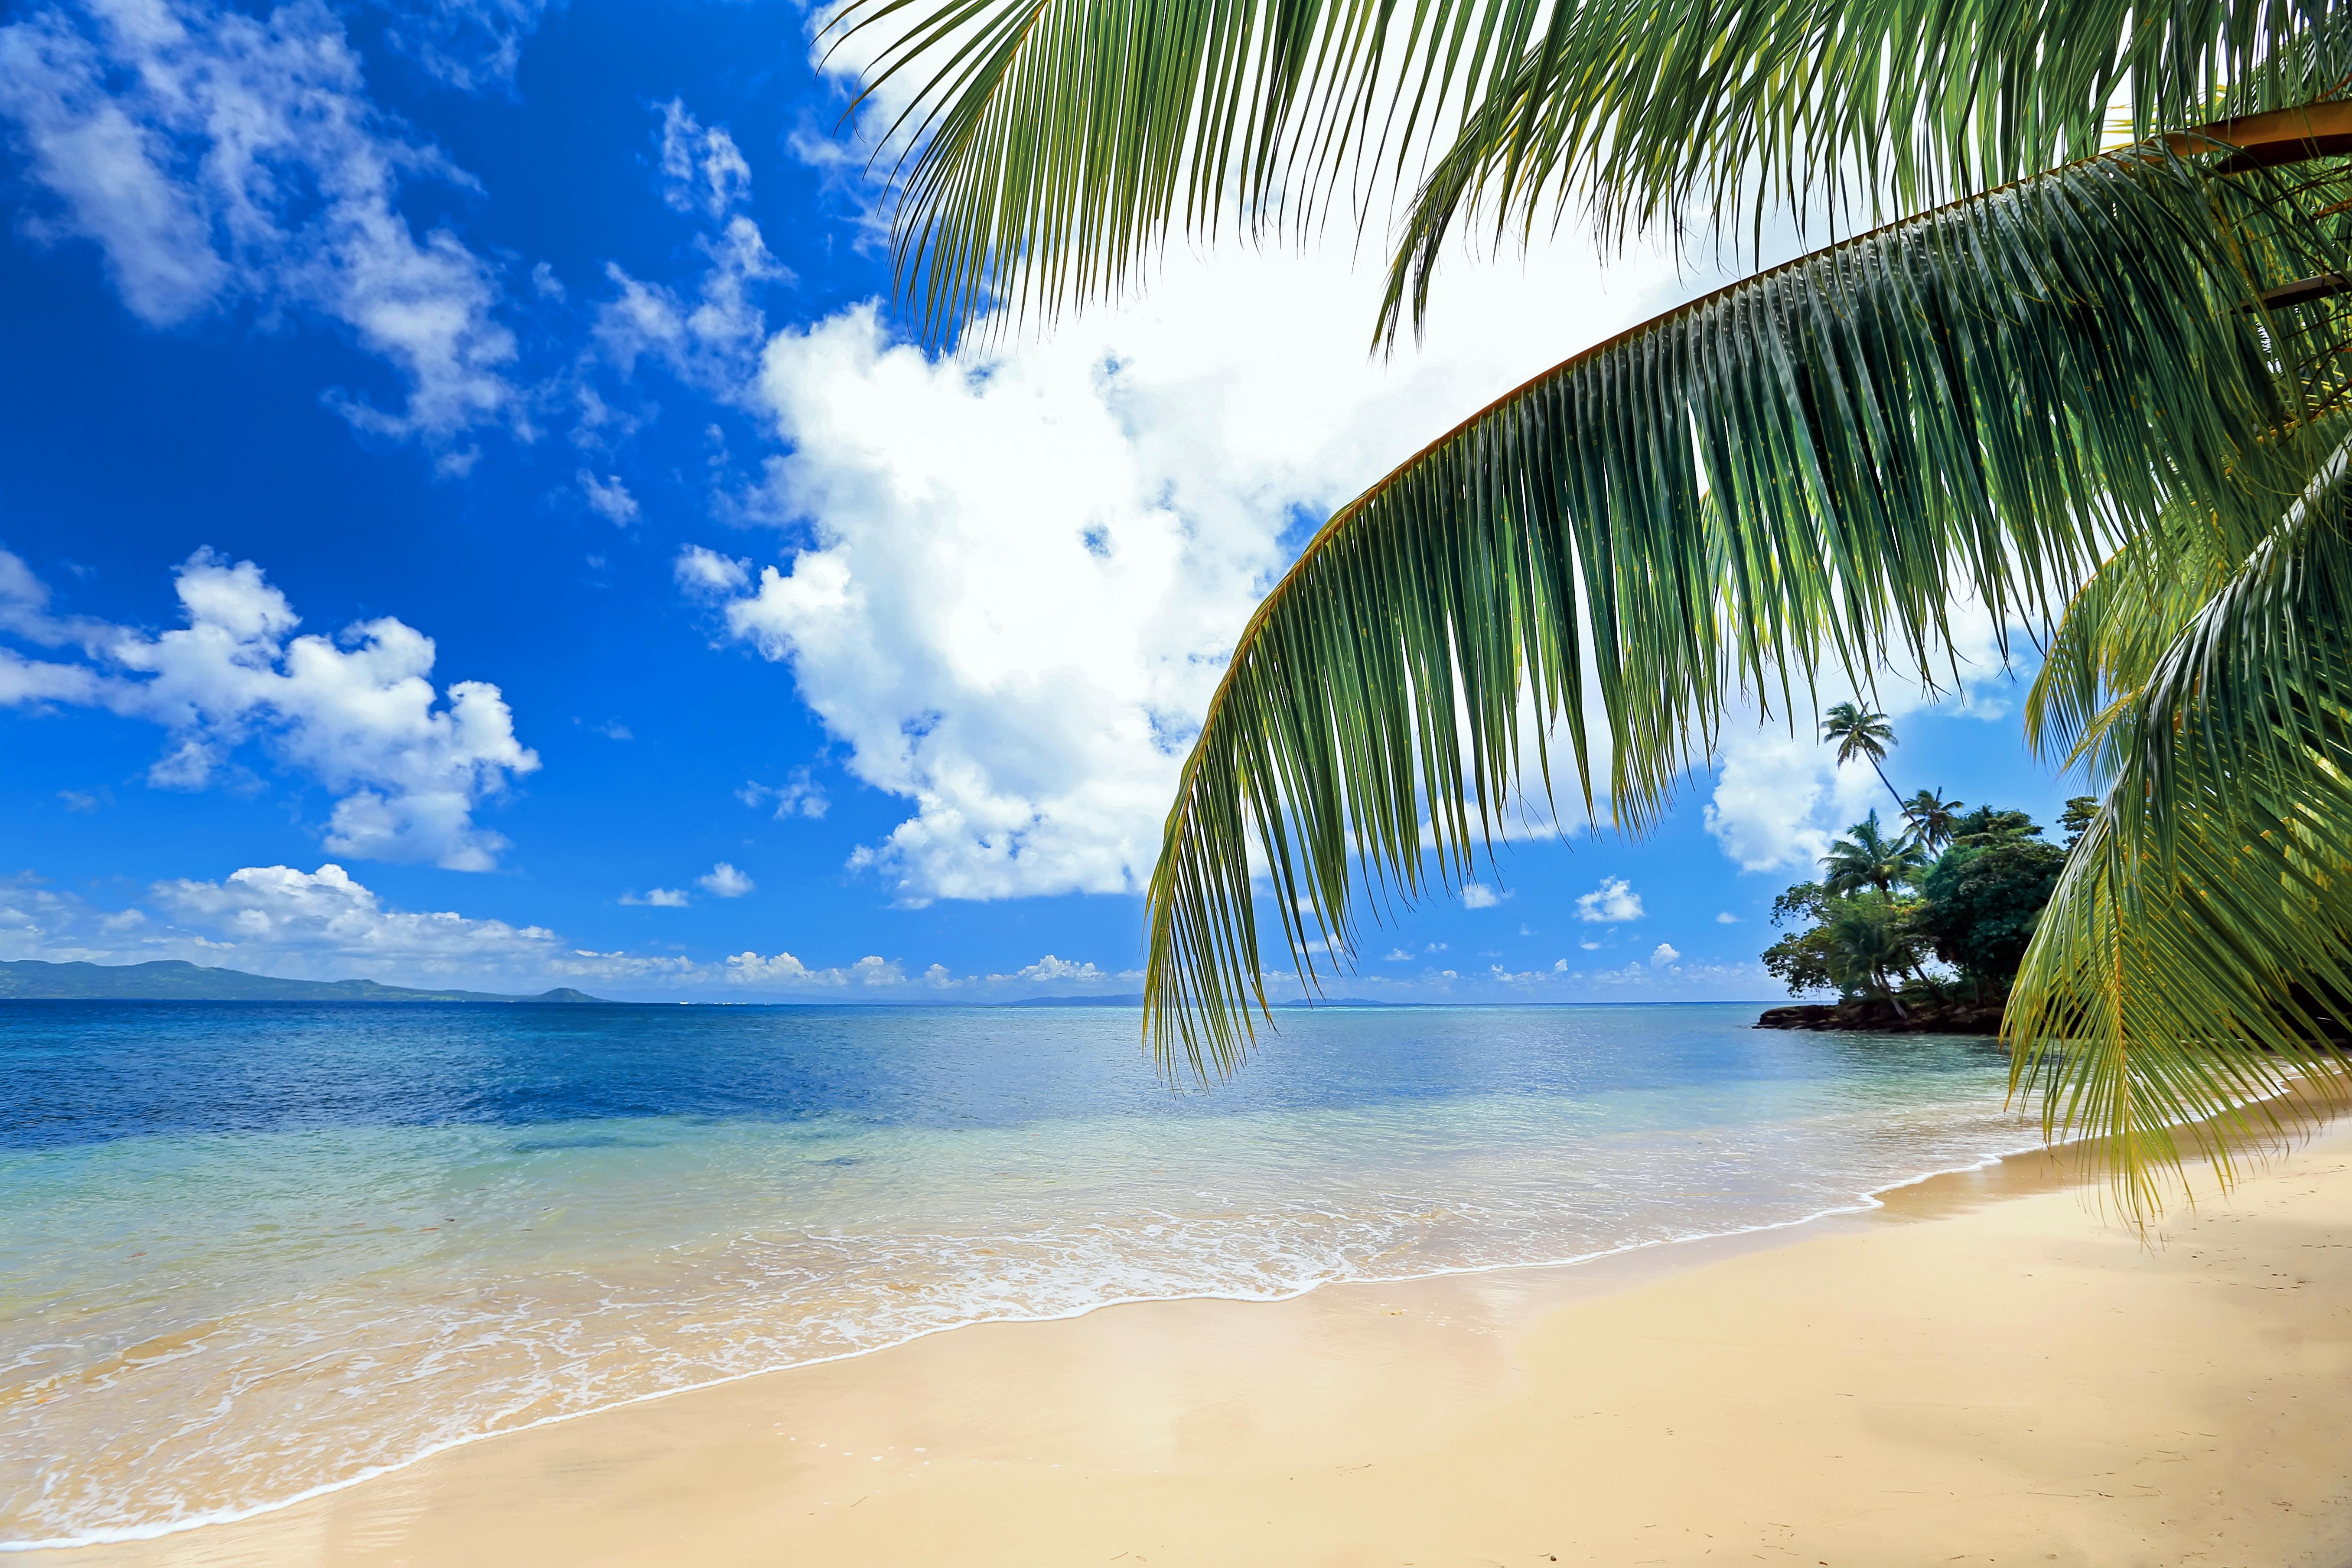 Острова пляжи море картинки